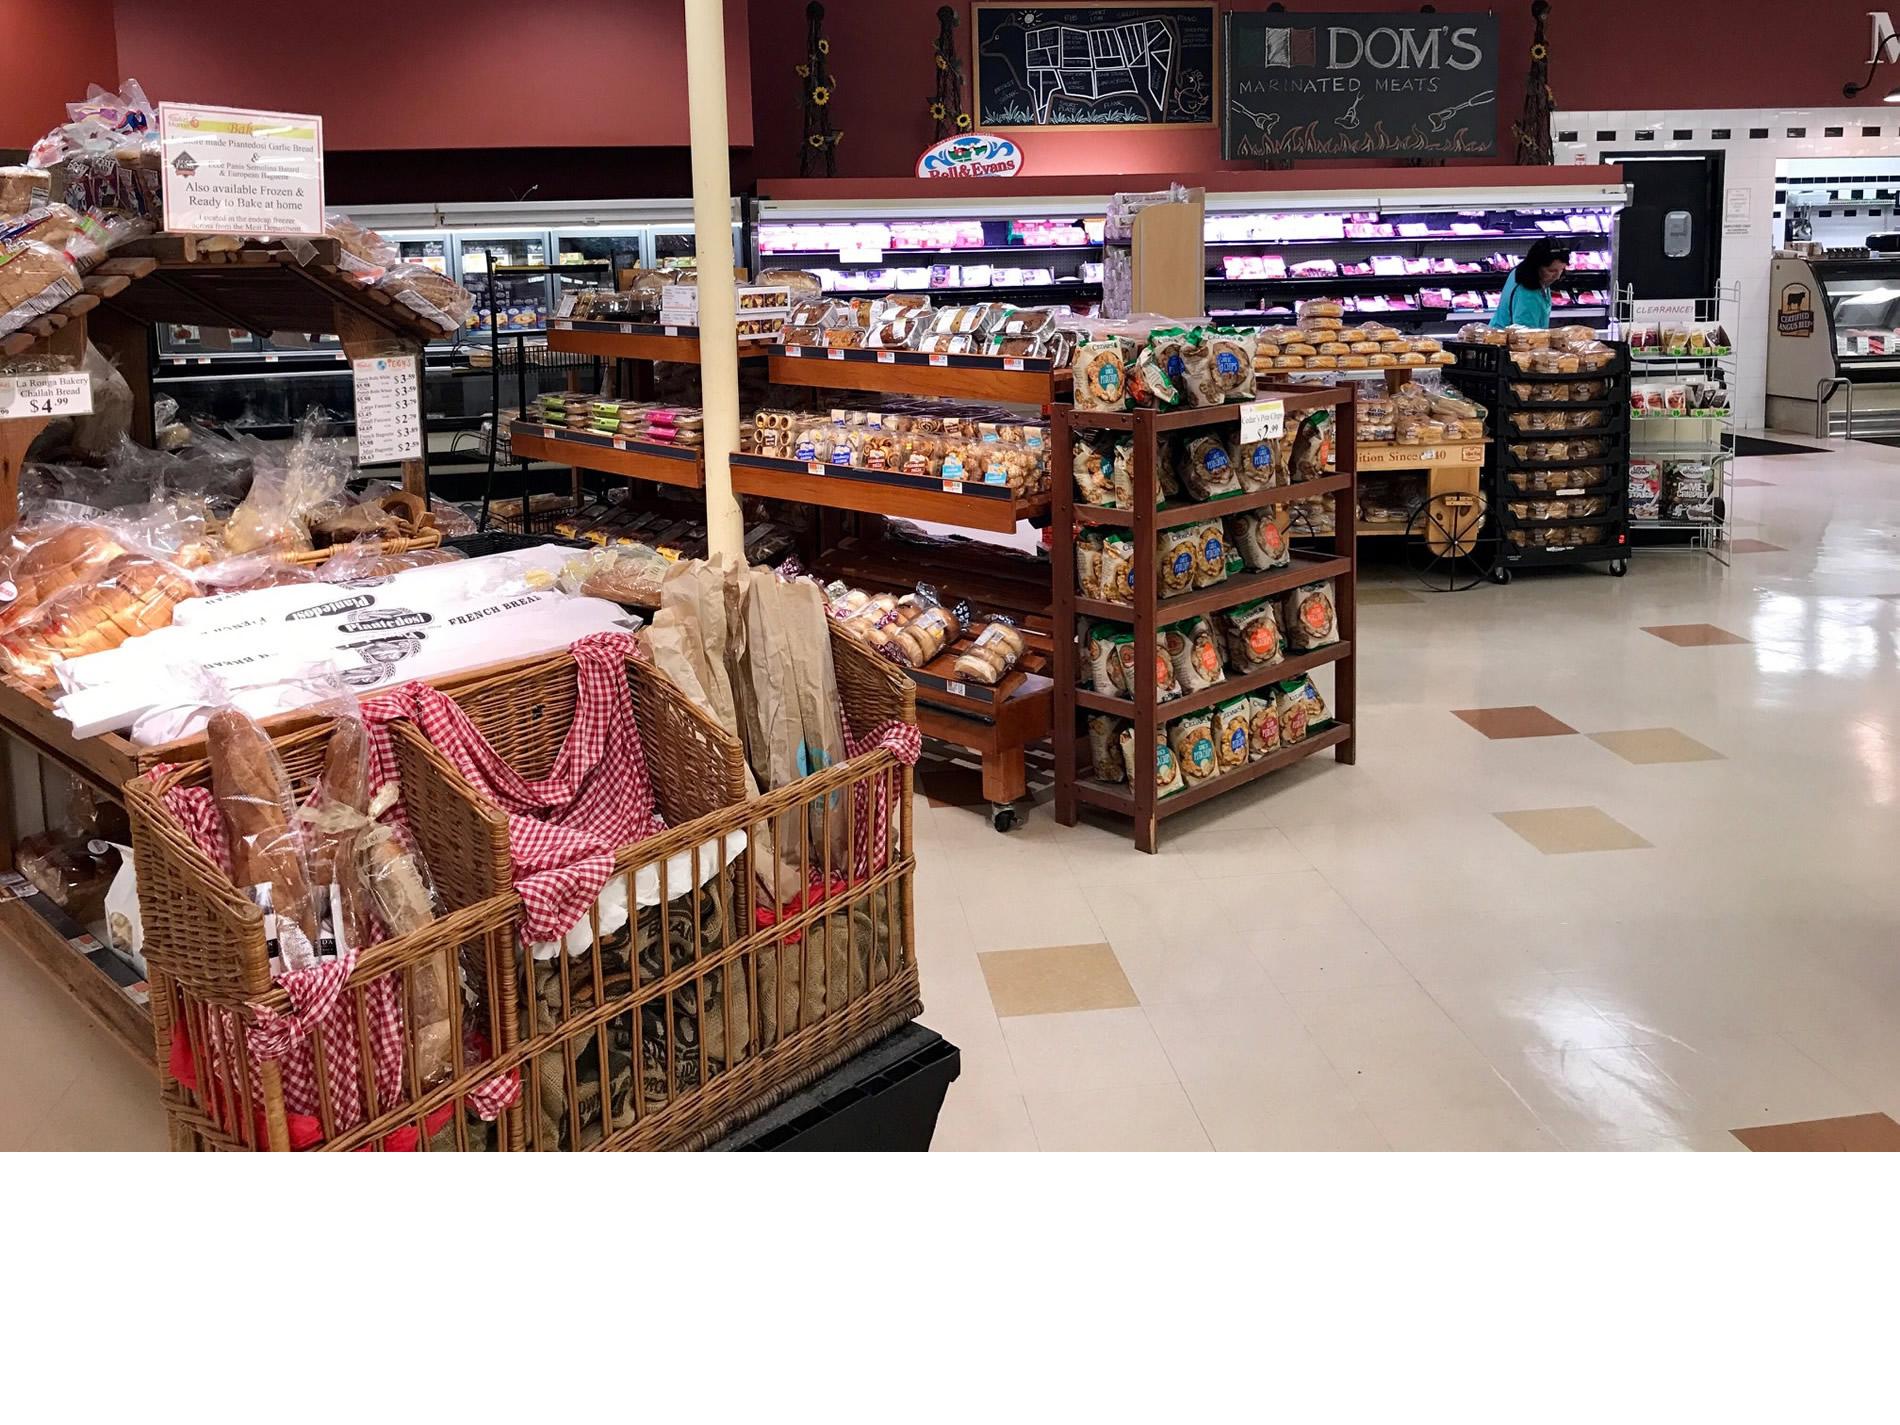 Foodies_Markets_Duxbury_13